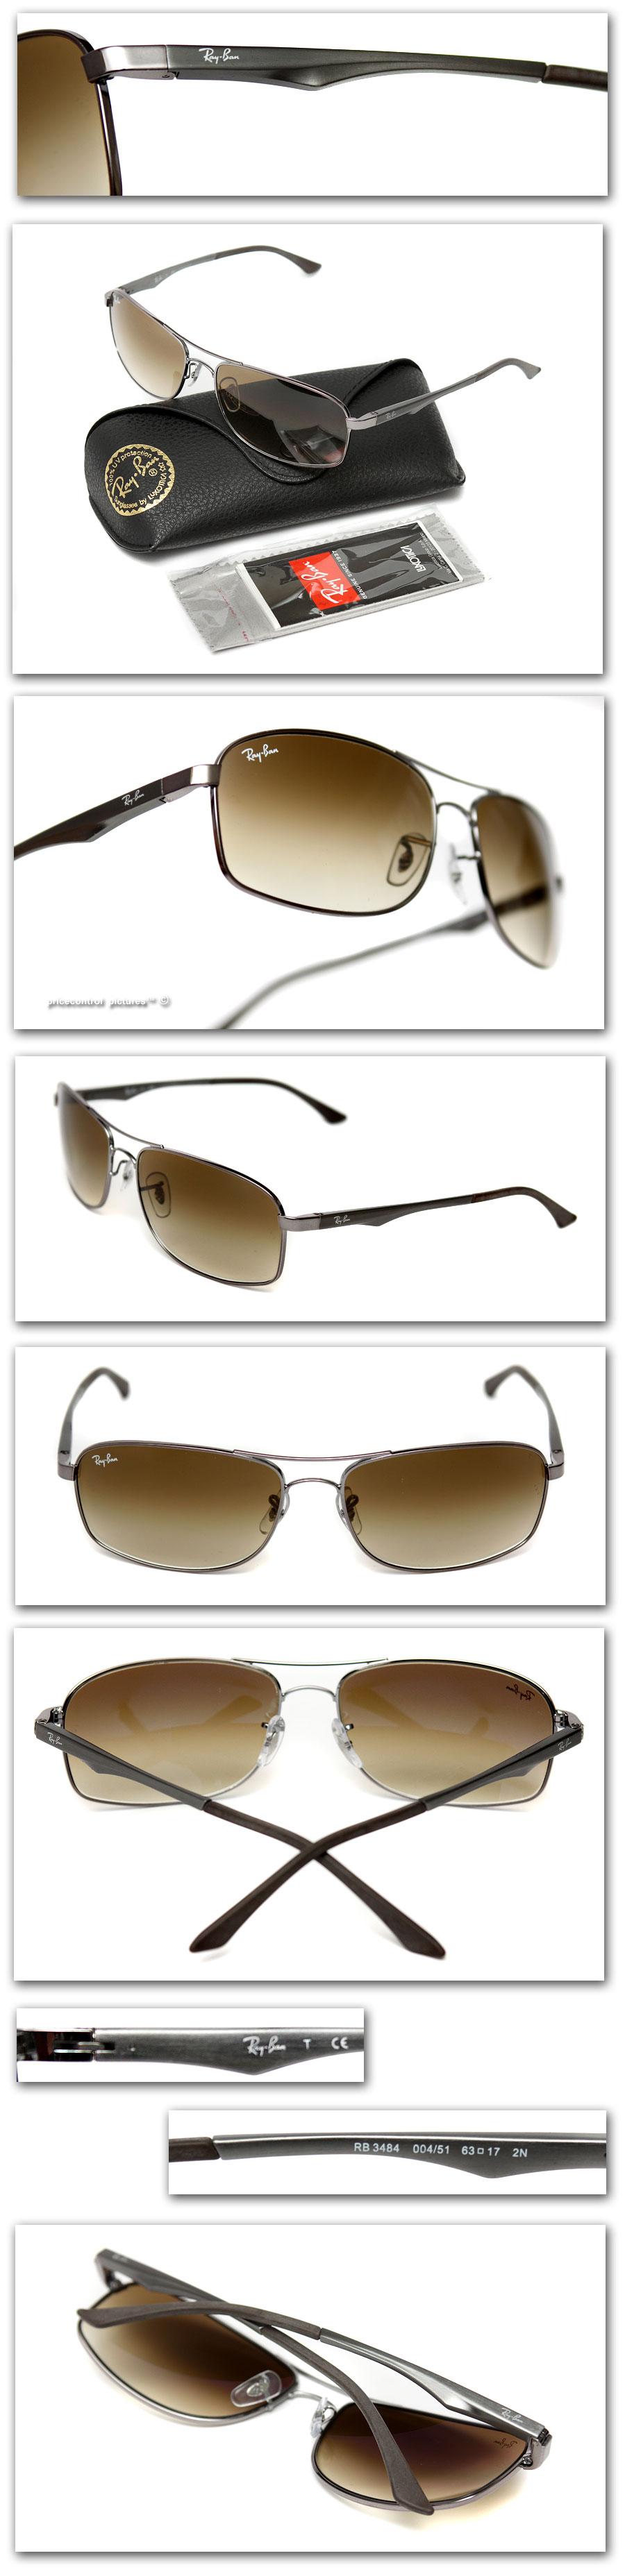 authentic oakley sunglasses  & authentic